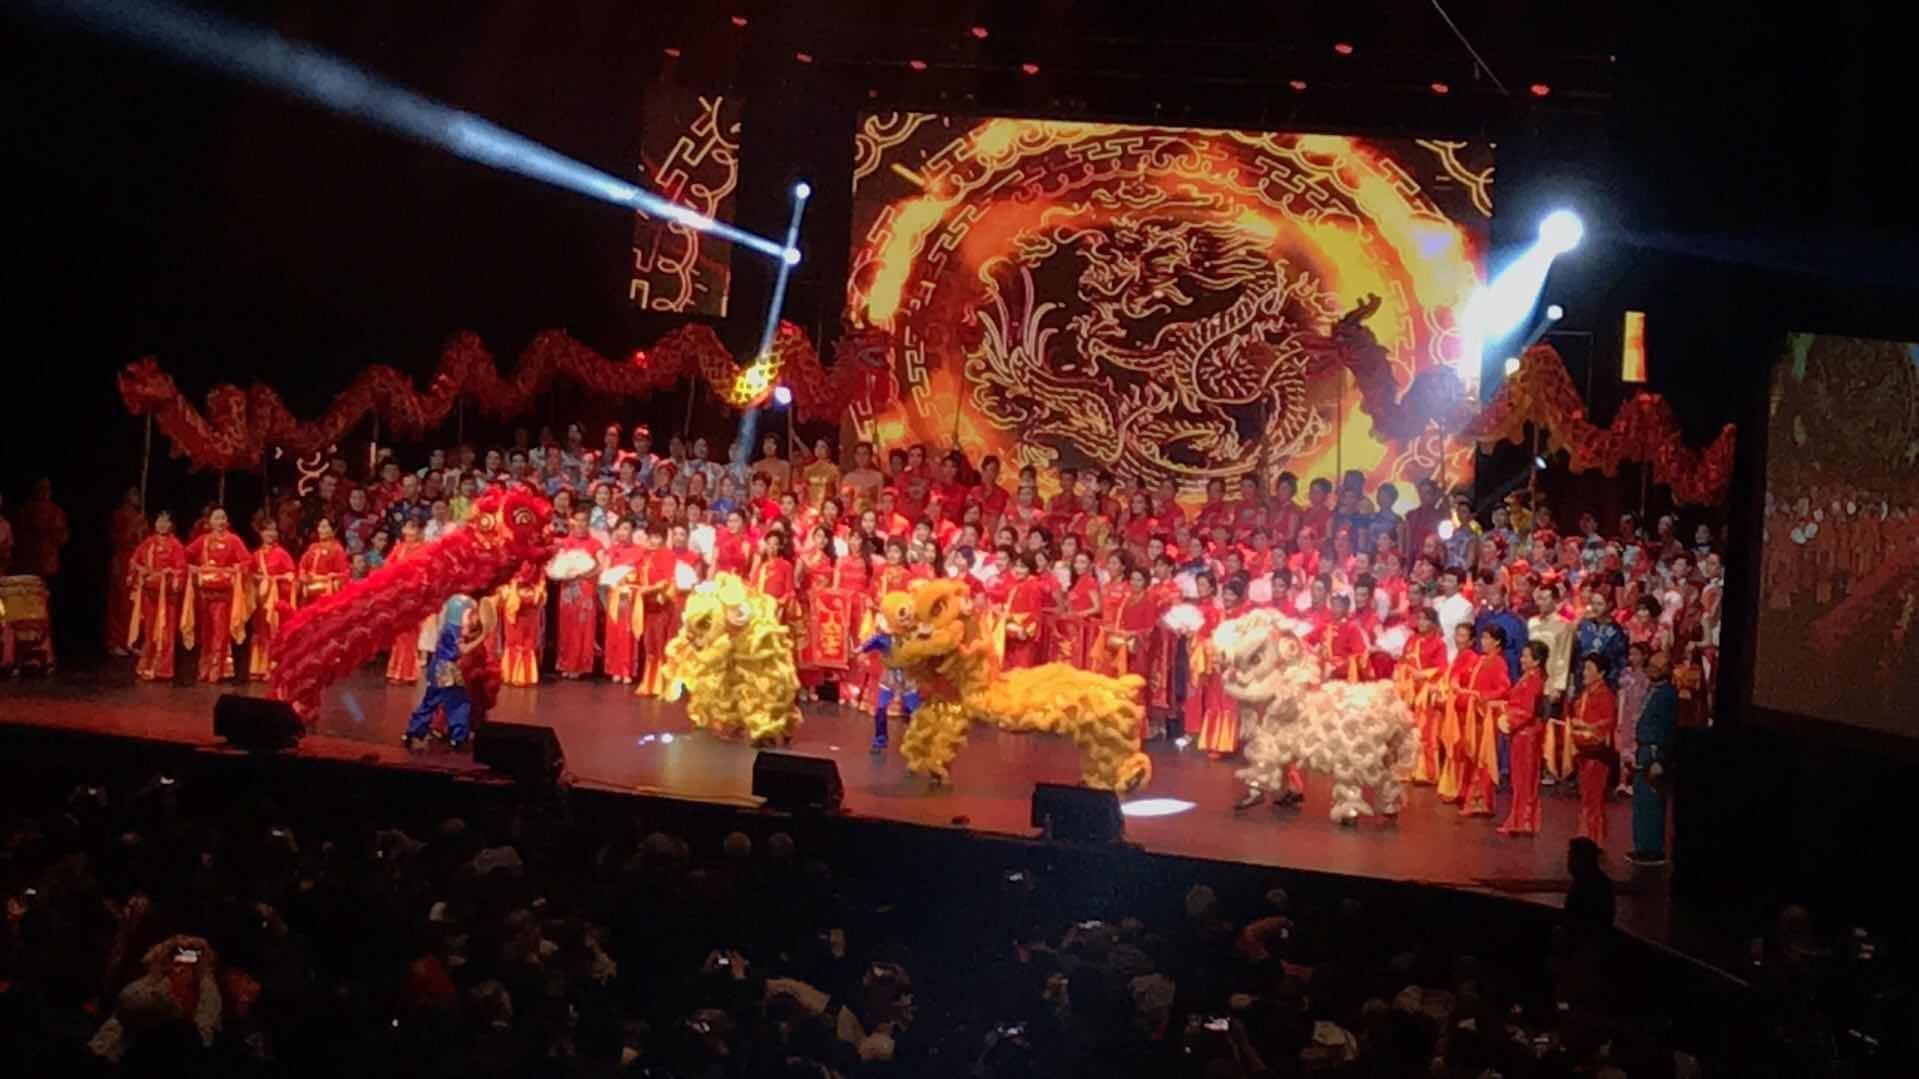 wayland-li-wushu-sony-centre-spring-festival-2018-gala-toronto-canada-07.jpg